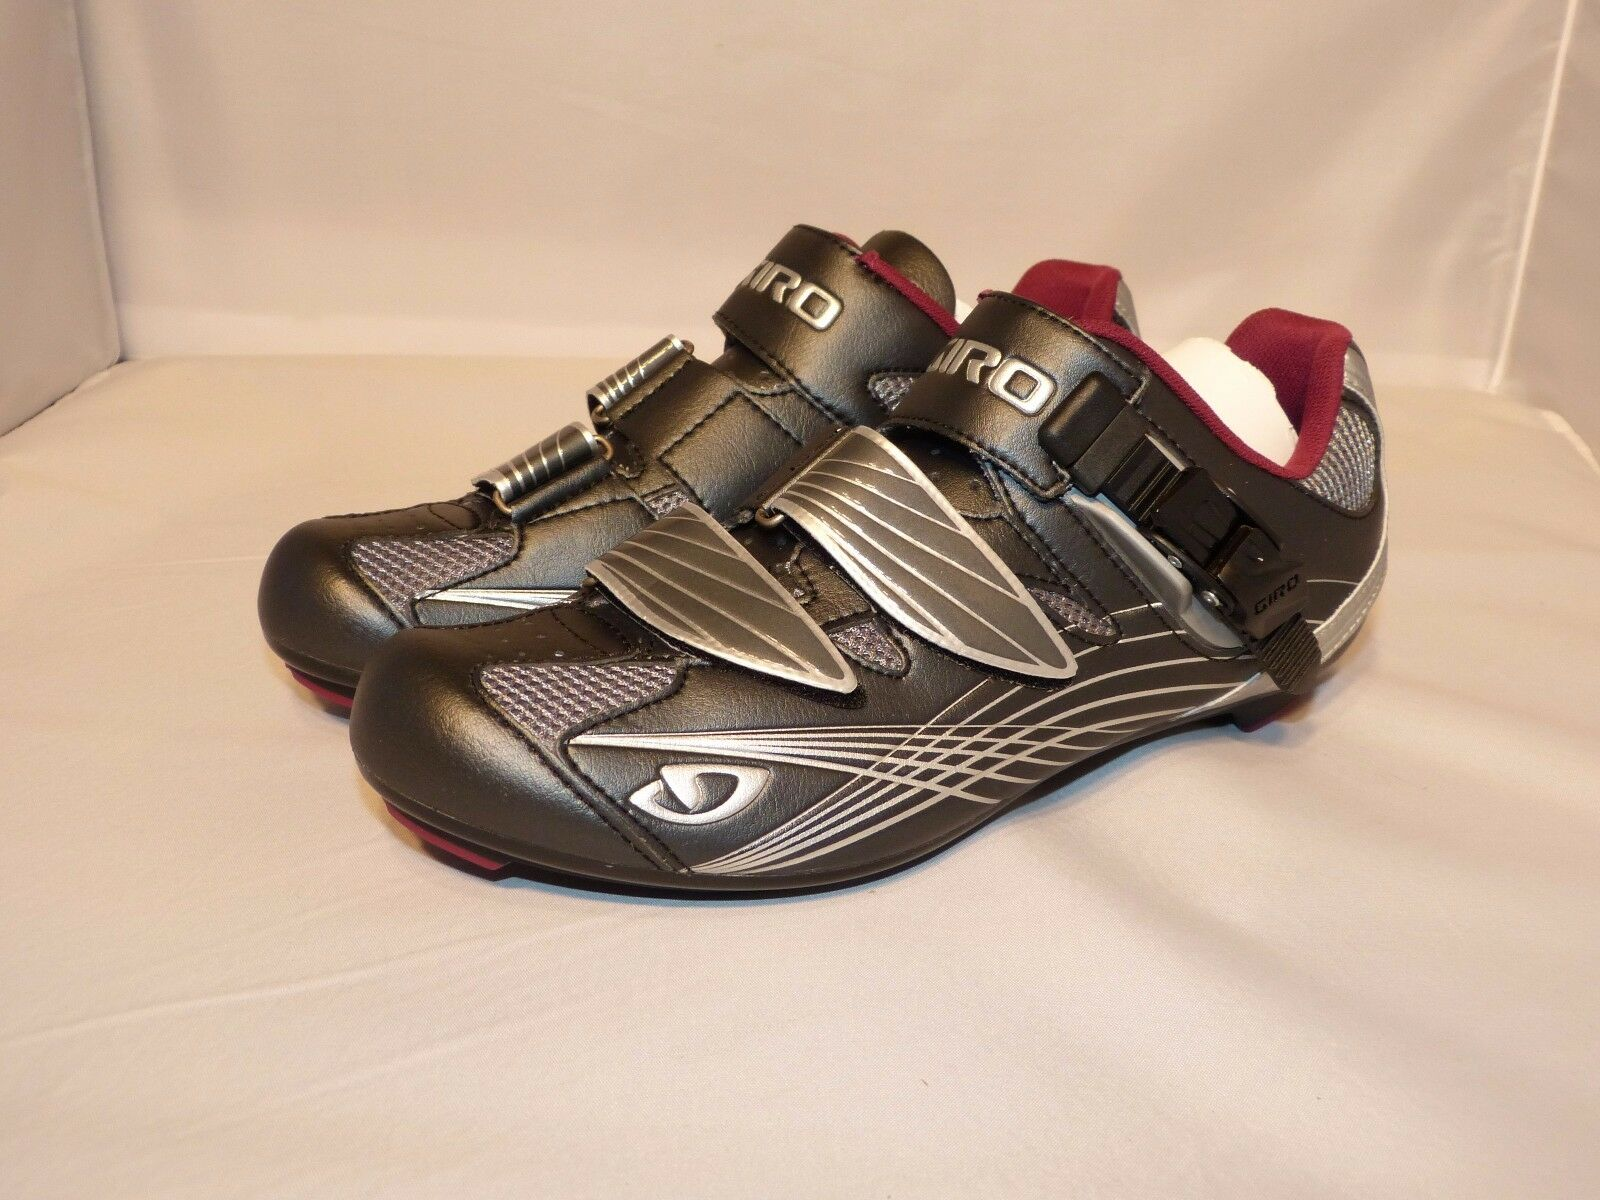 Giro Solara Women's Road Cycling shoes Gunmetal Berry 3 bolt cleats NEW